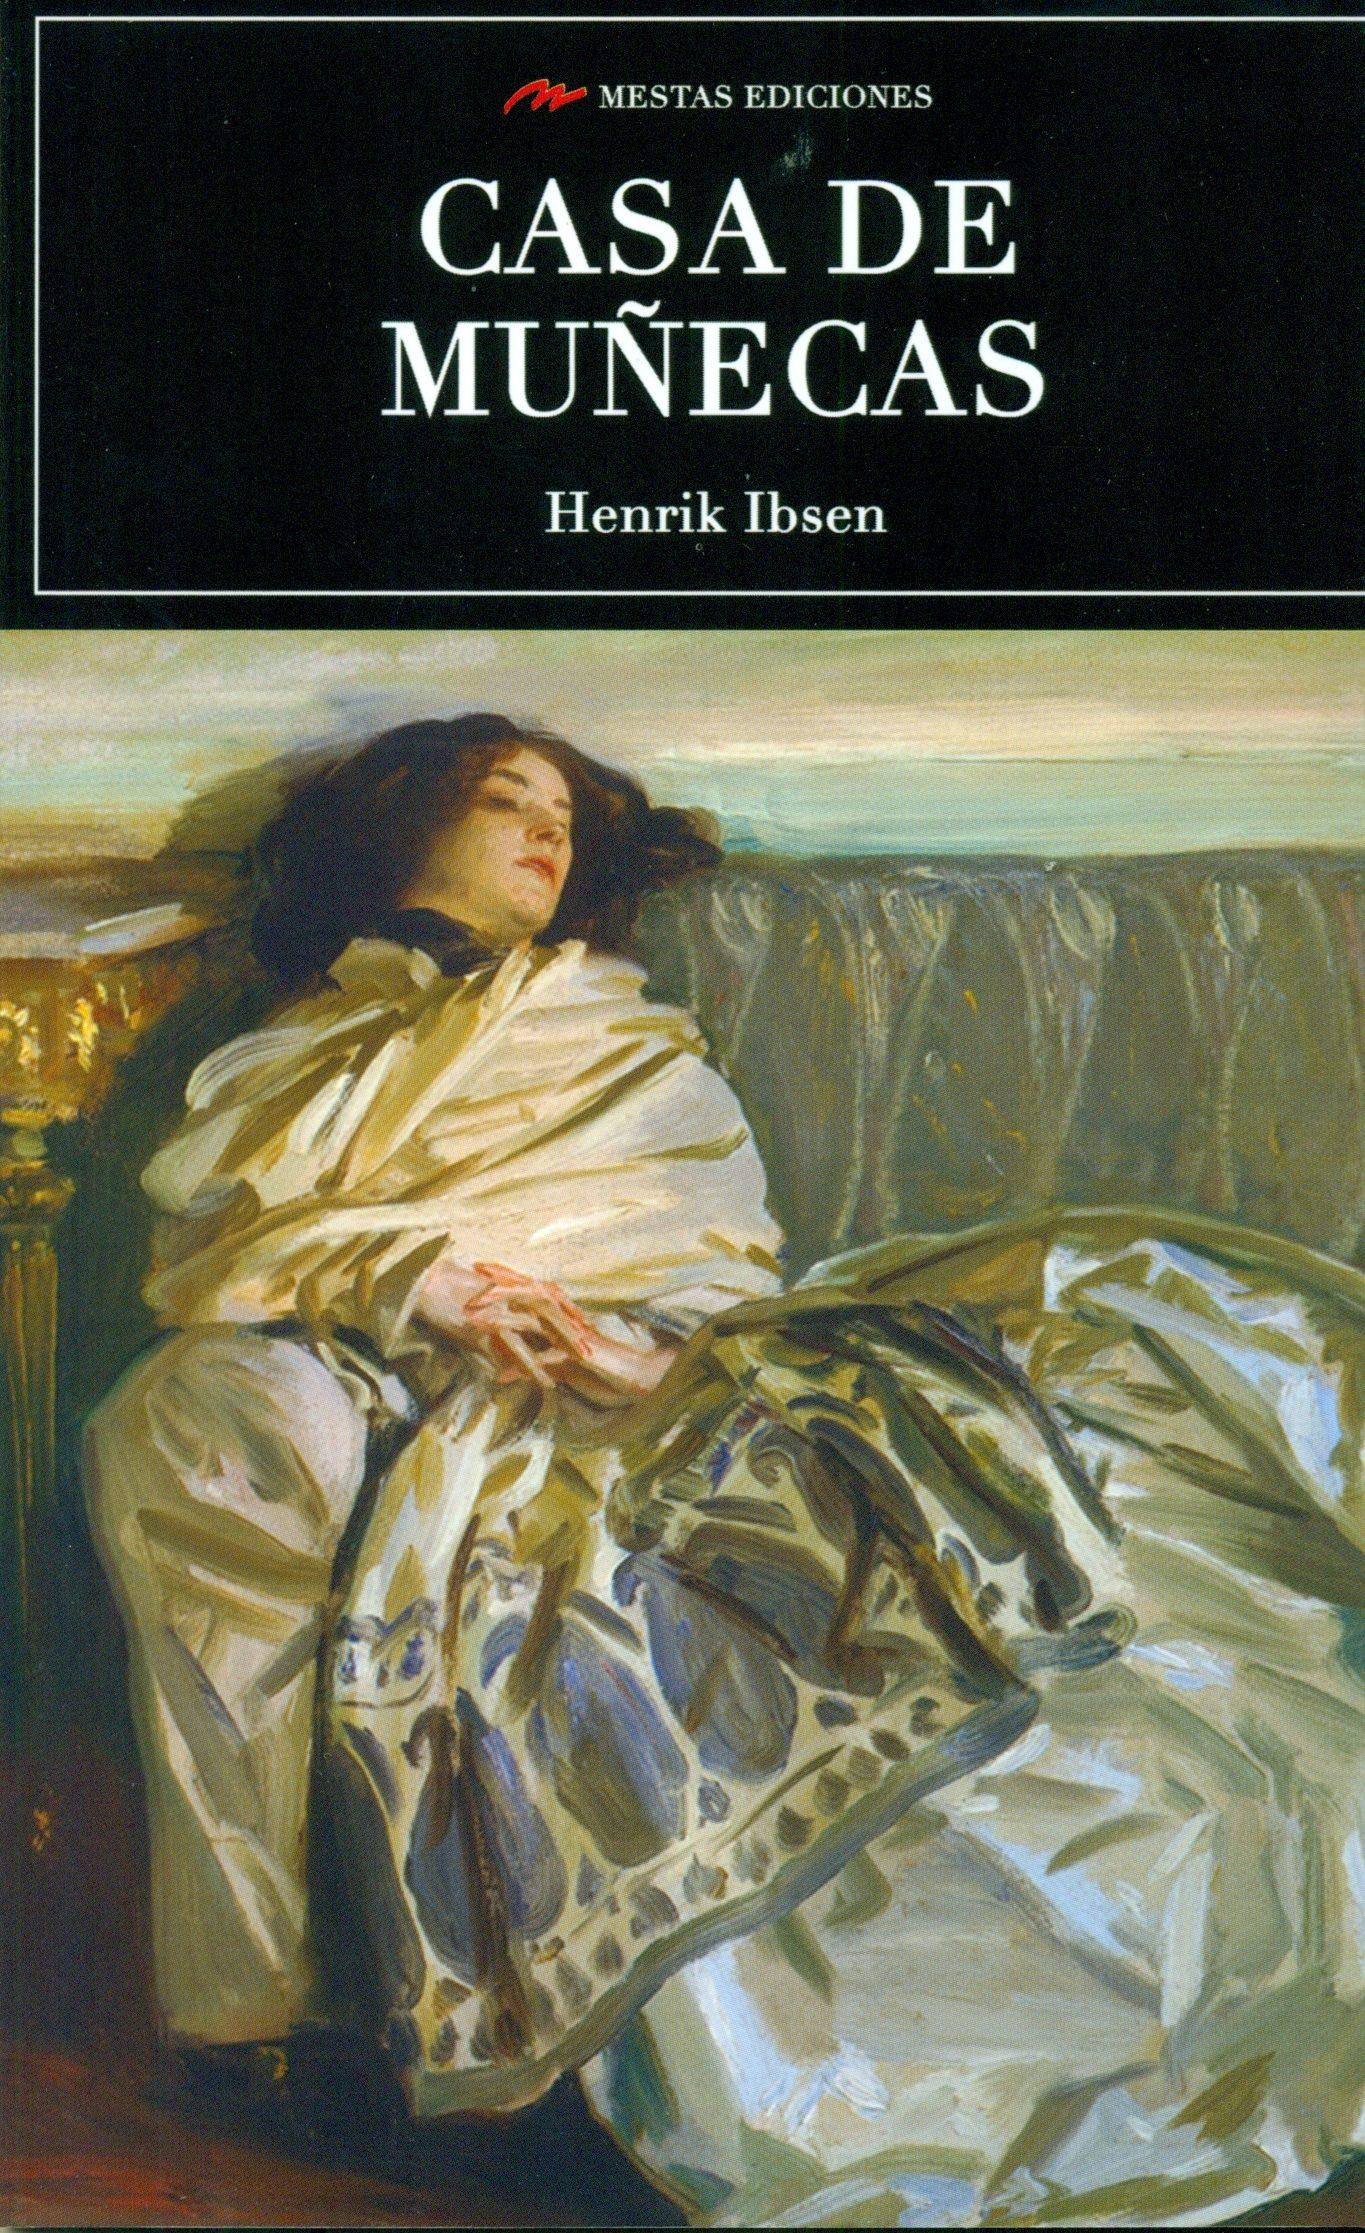 CASA DE MUÑECAS   HENRIK IBSEN   Comprar libro 9788416775101